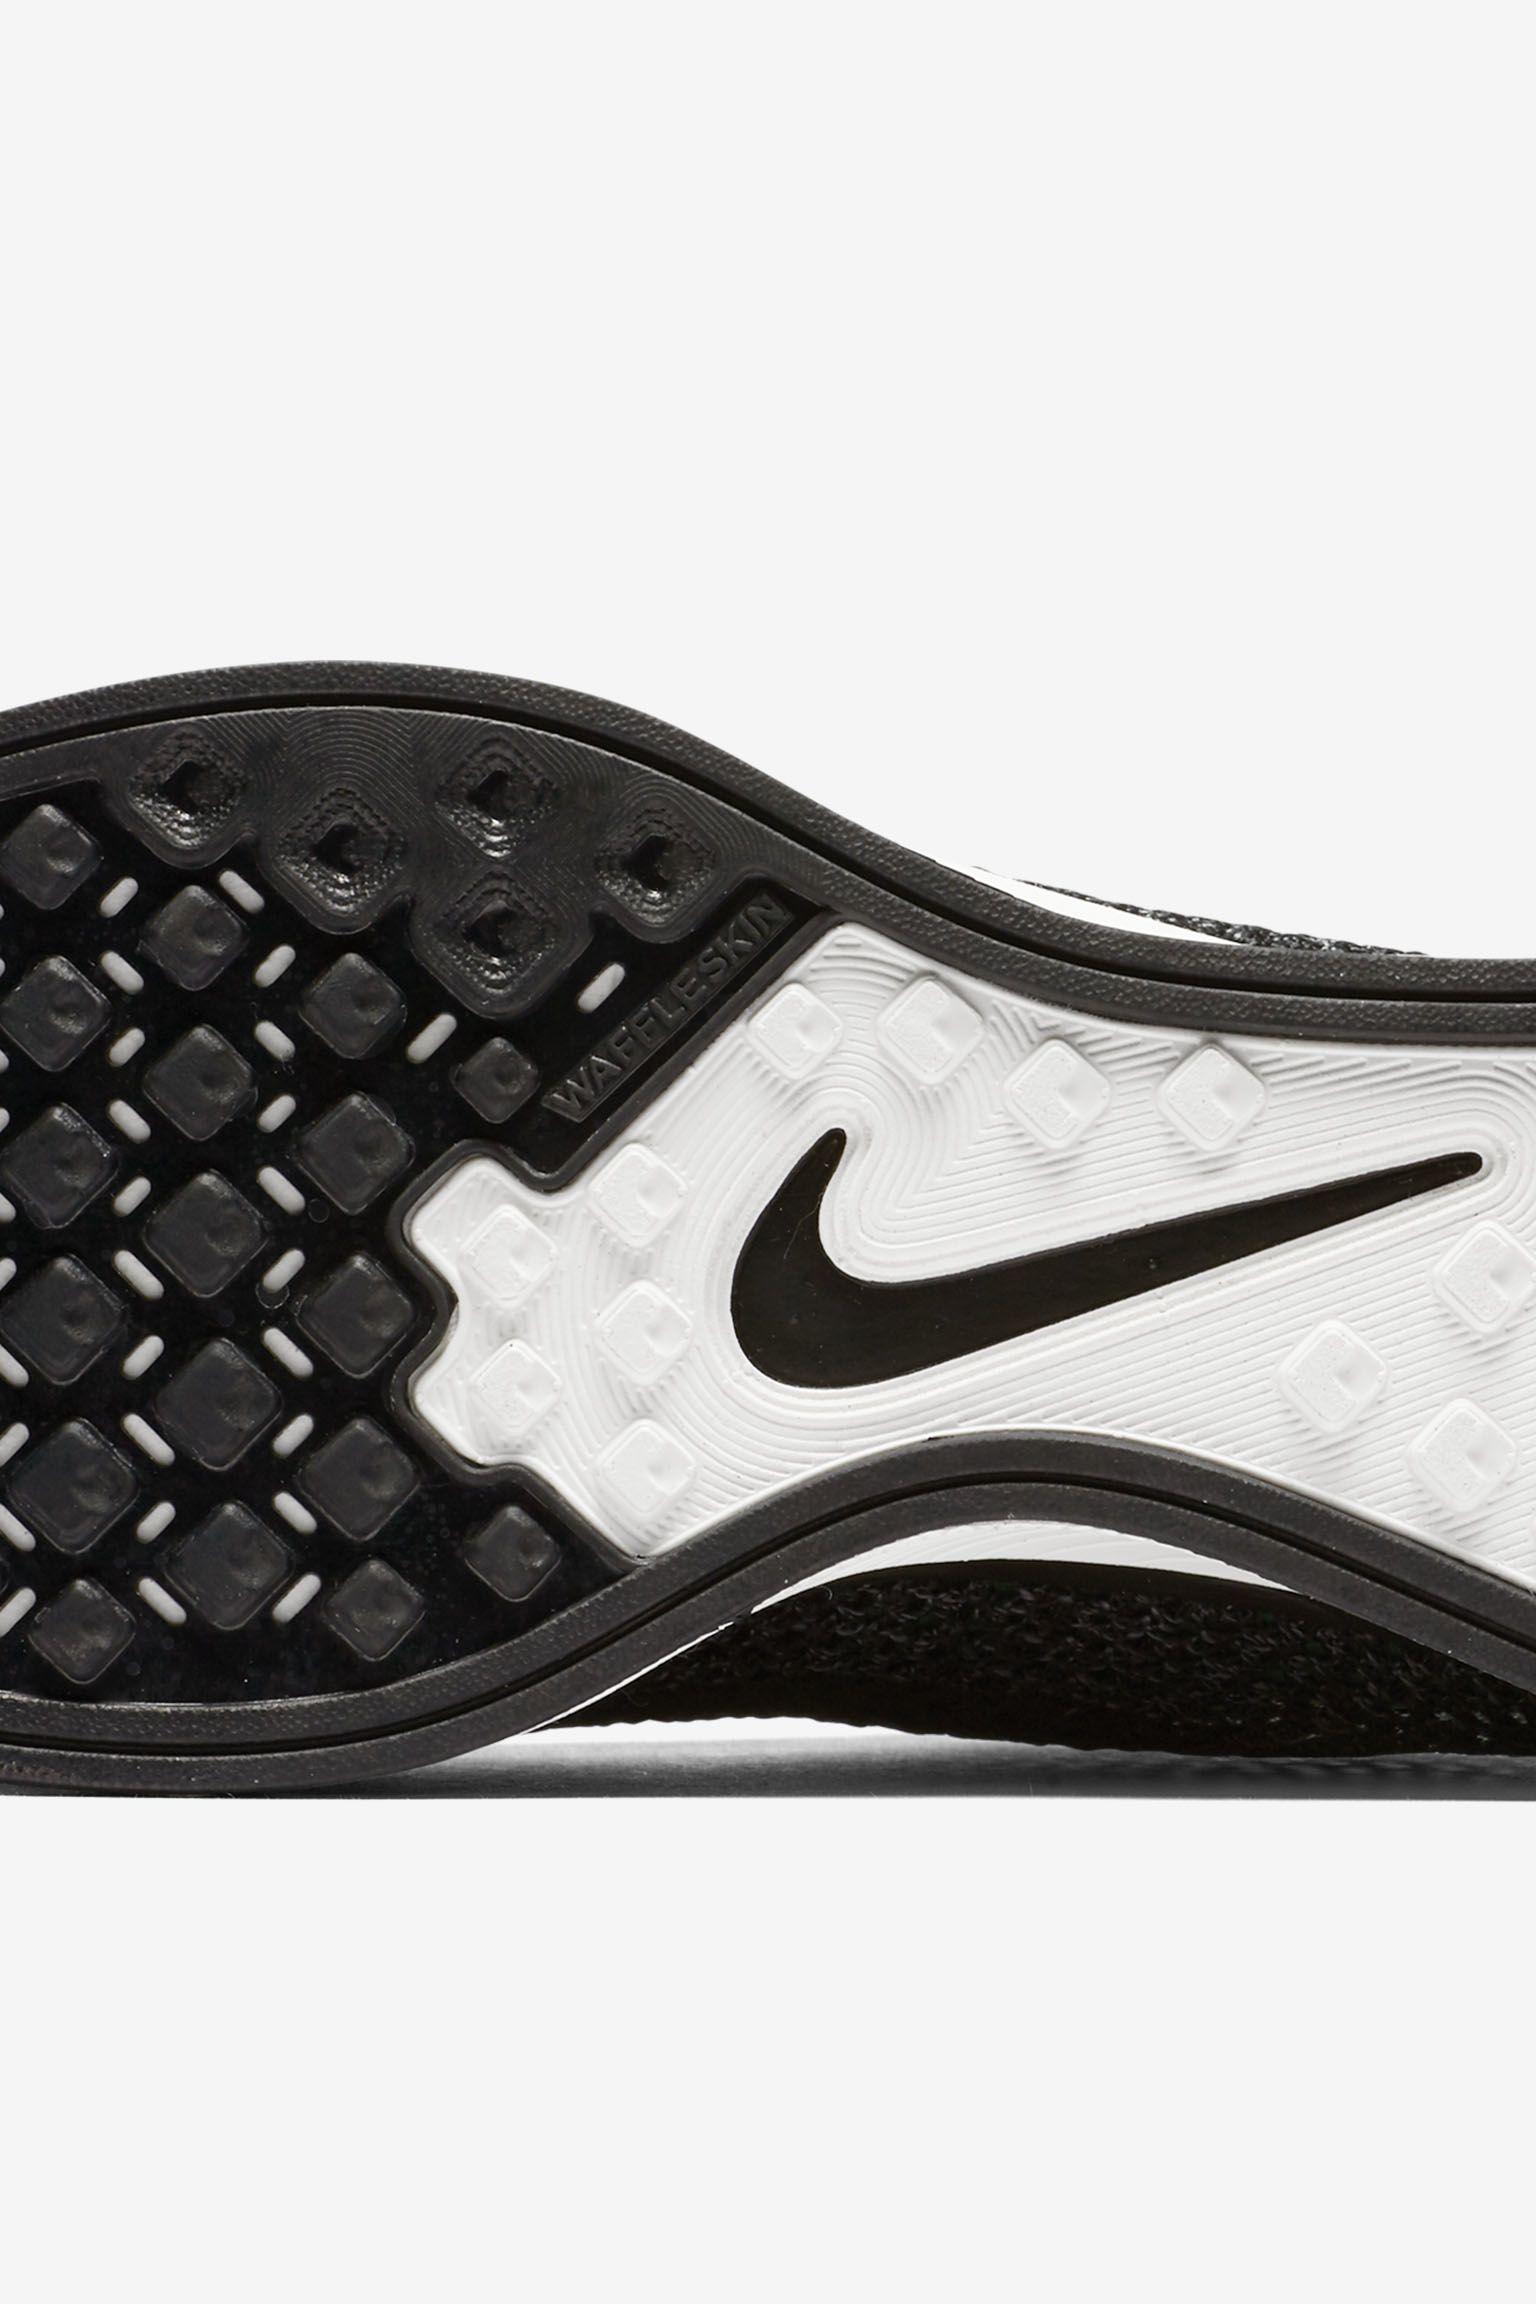 Nike Flyknit Racer 'Pitch Black'